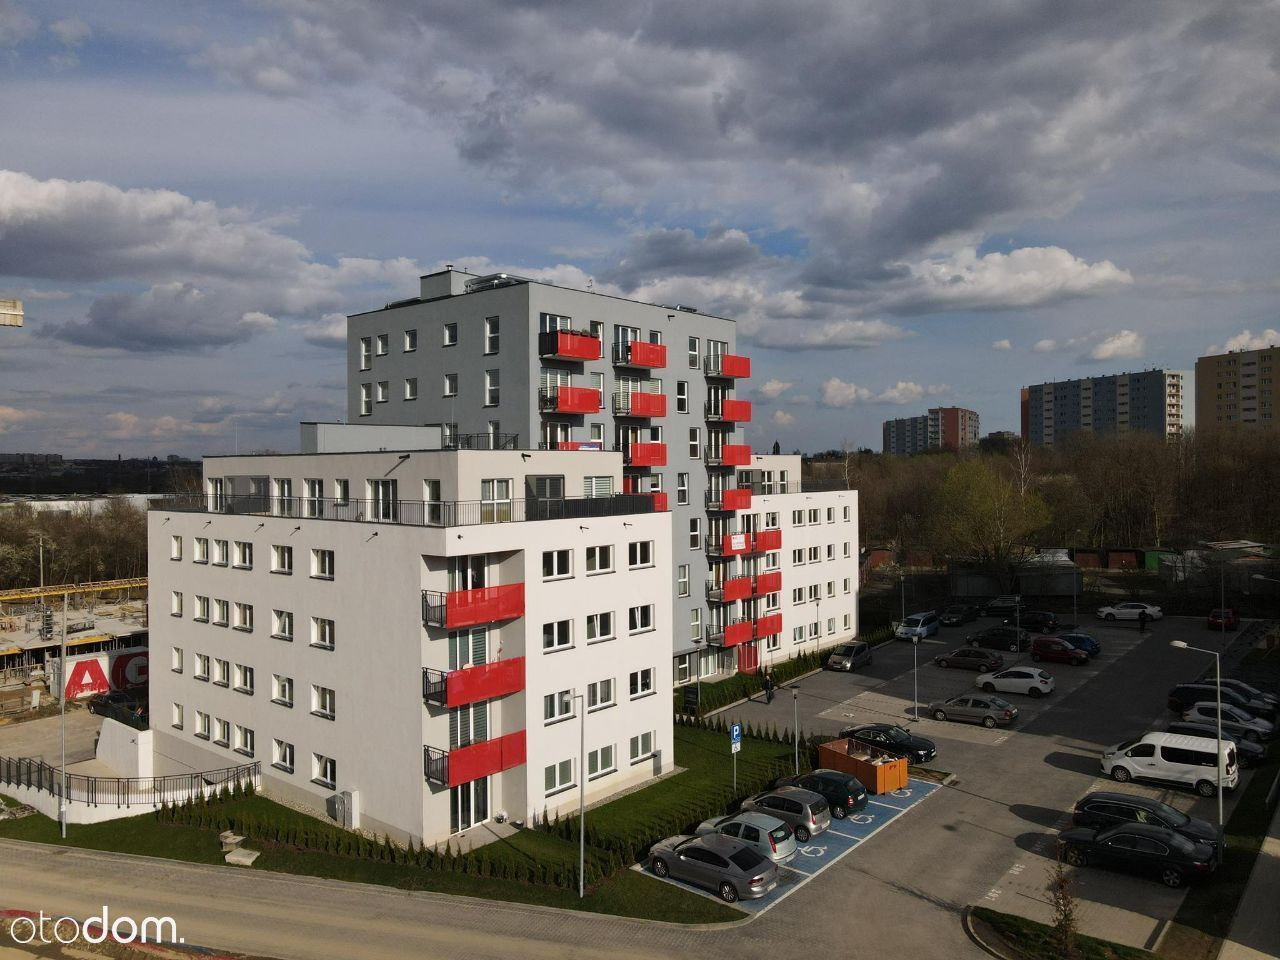 Apartament 2 pokoje, 35m2 + TARAS! Bezpośrednio!